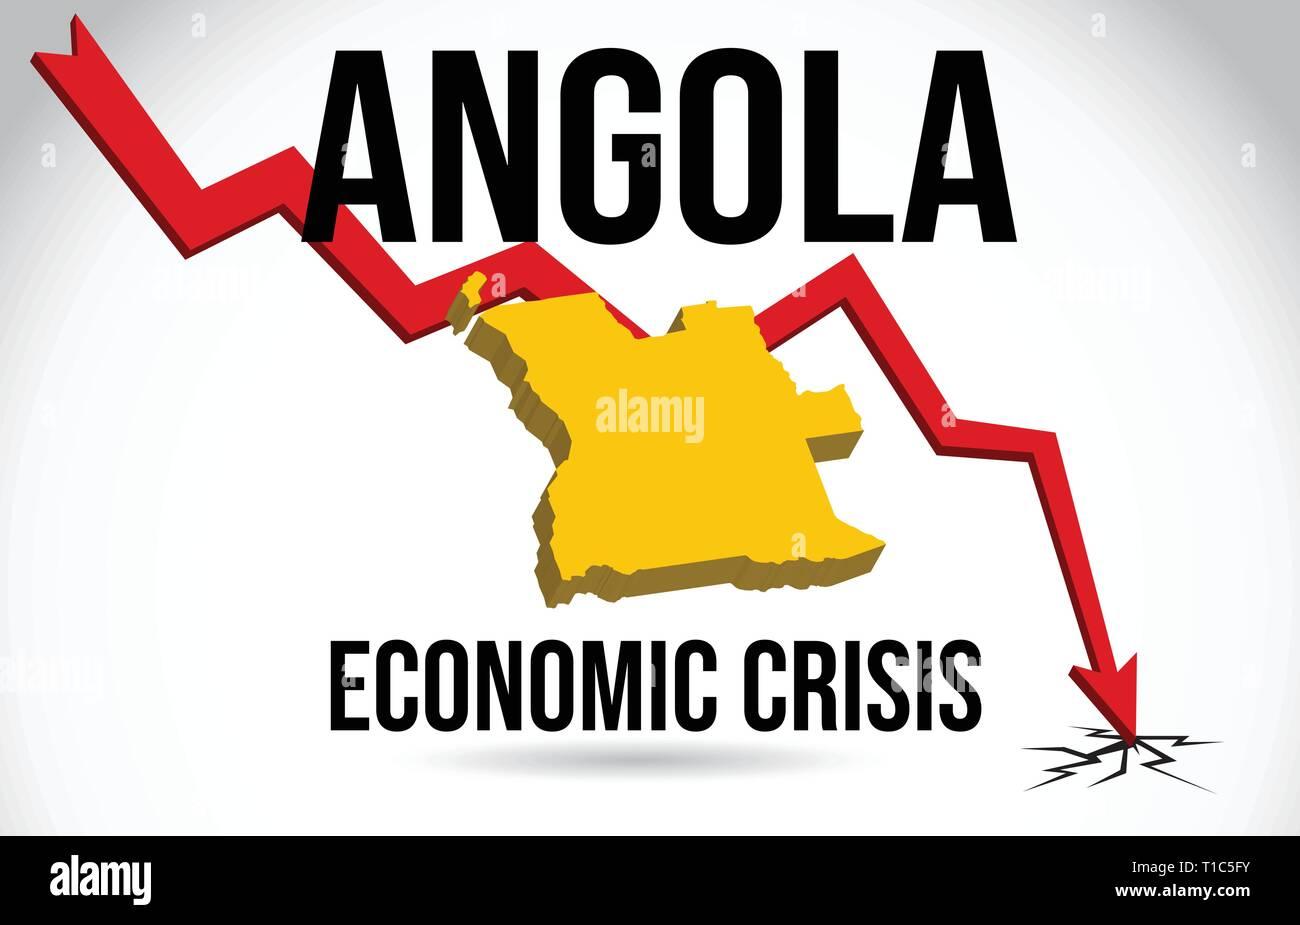 Angola Map Financial Crisis Economic Collapse Market Crash Global Meltdown Vector Illustration. - Stock Vector